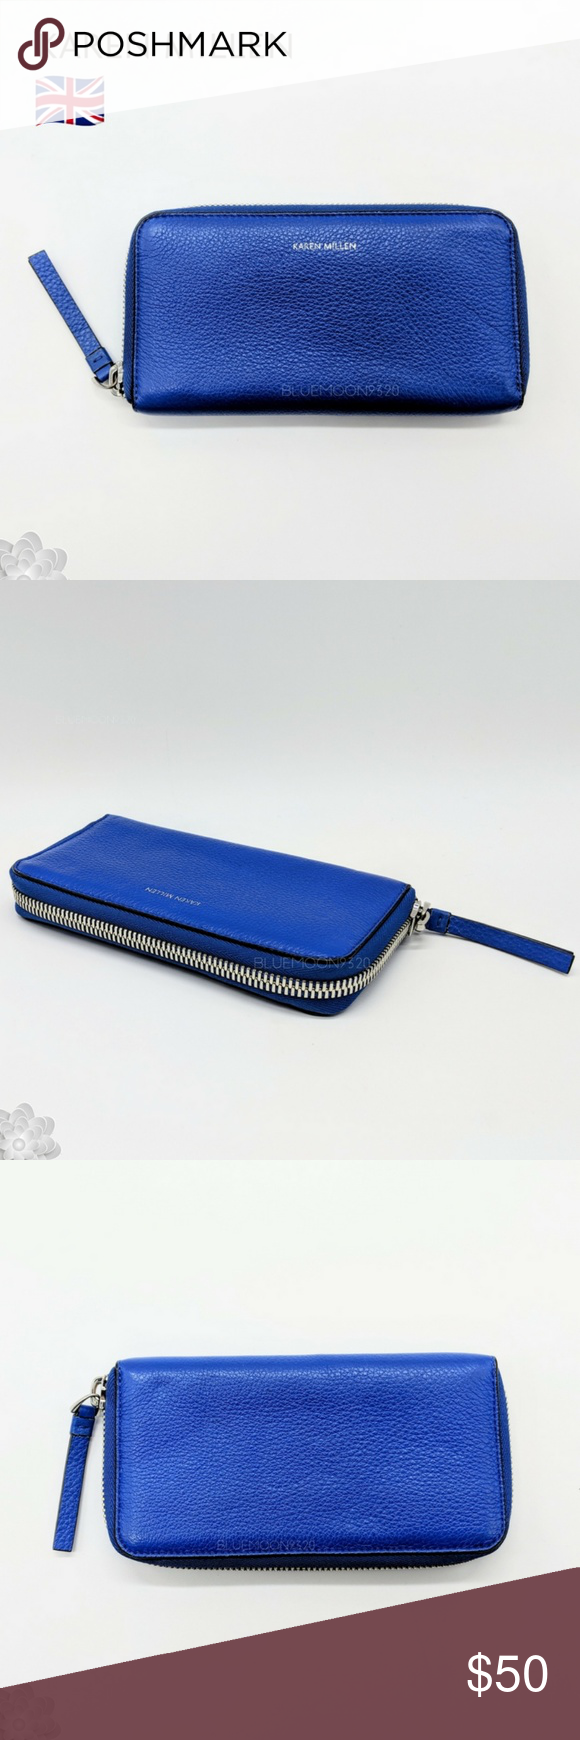 79cae021a42 KAREN MILLEN ENGLAND Wallet This leather zip around wallet is about 7.5